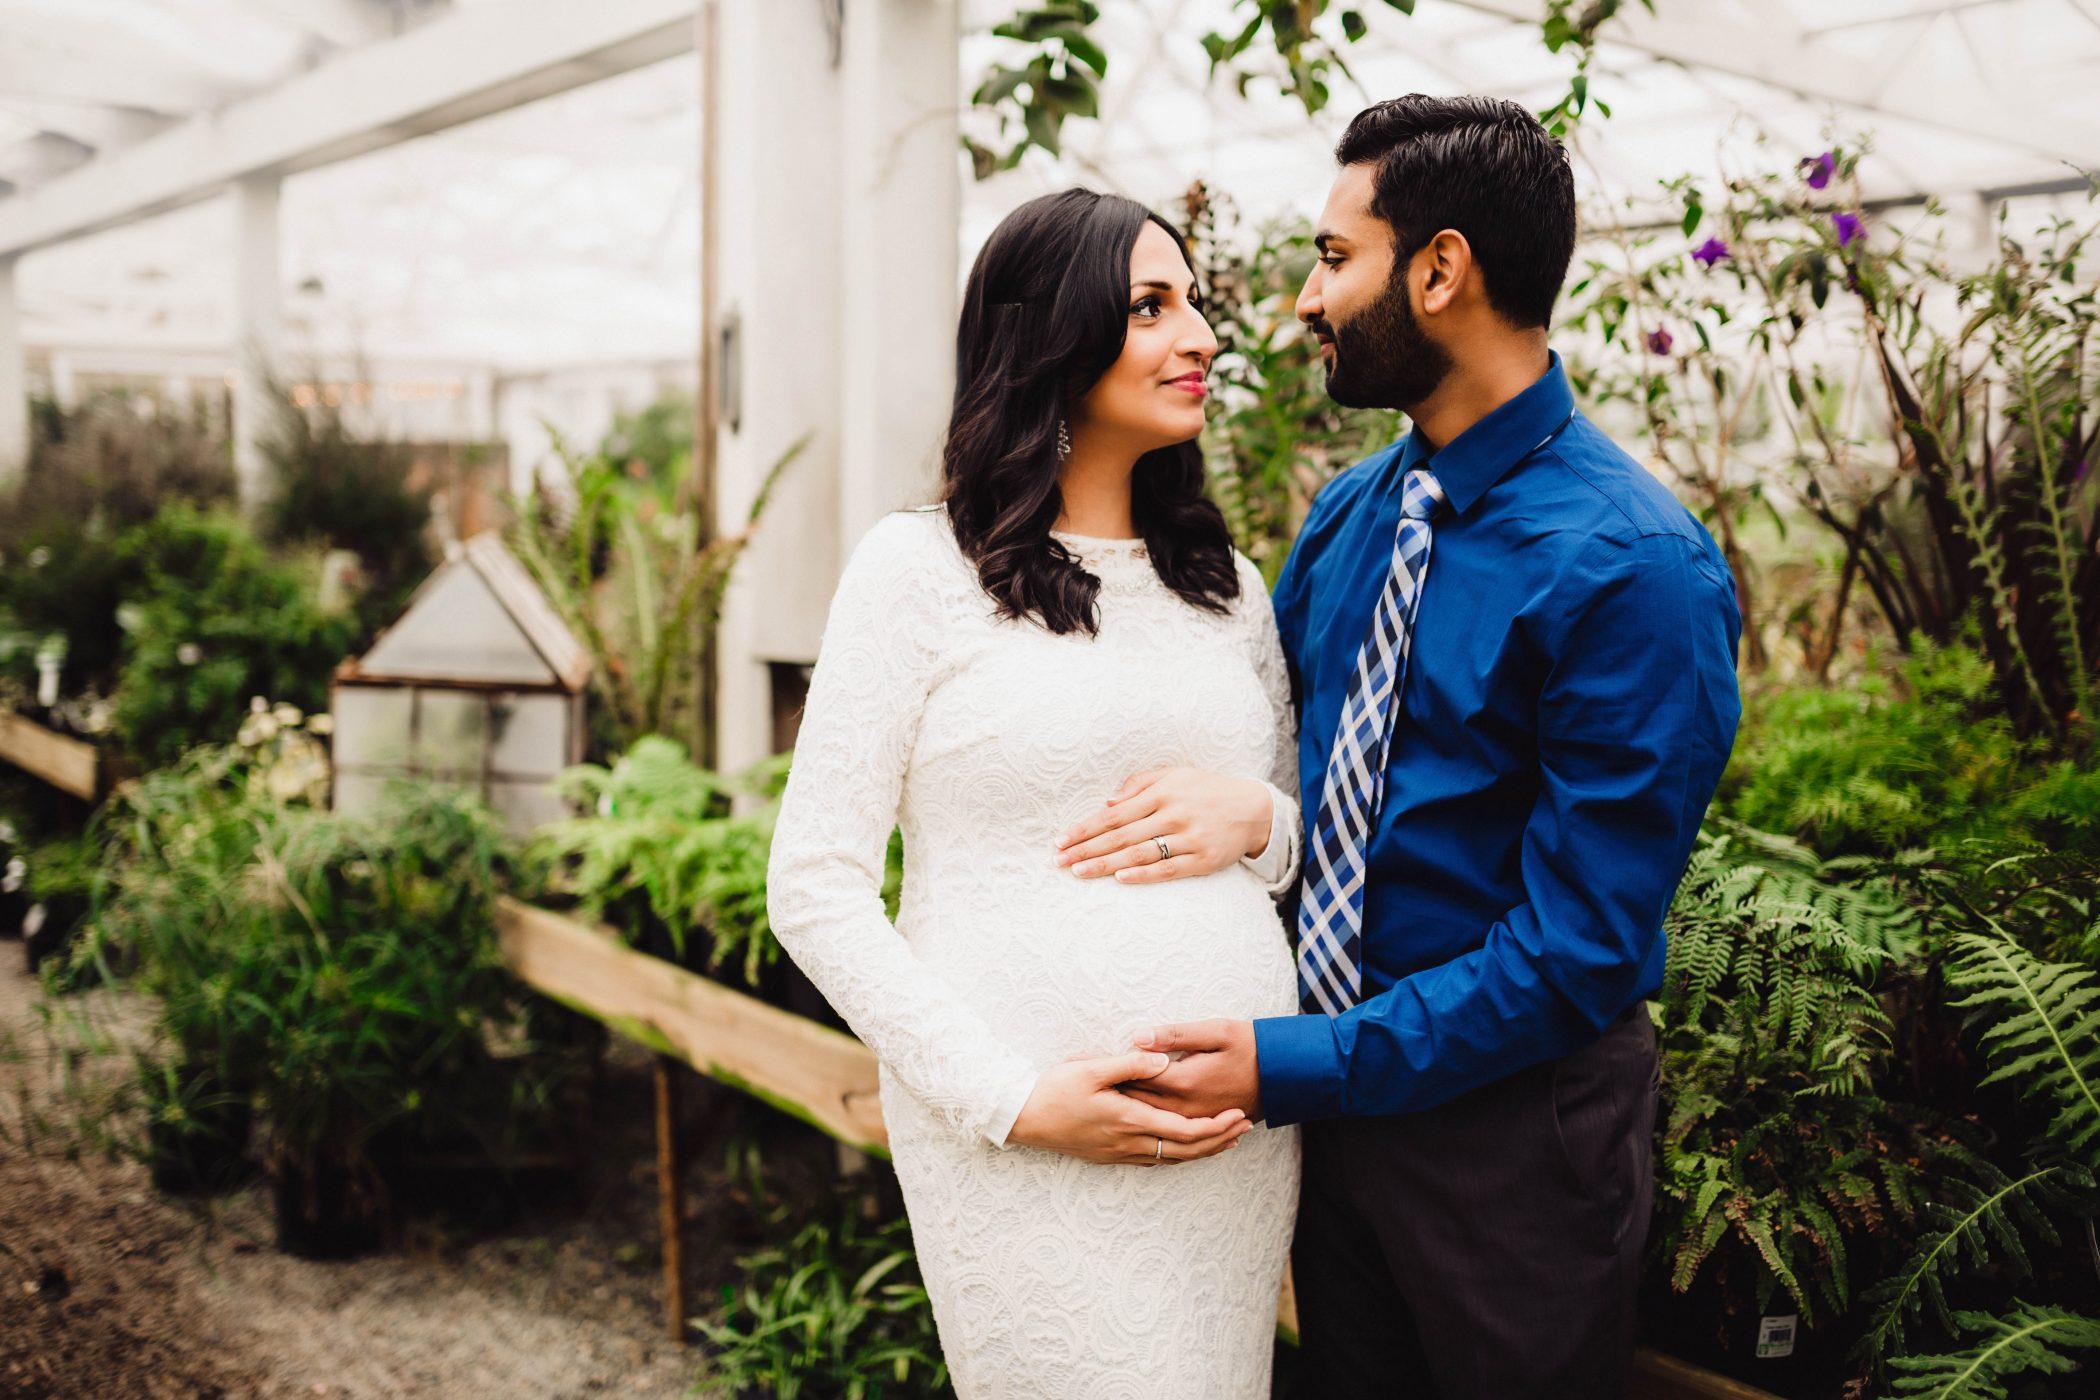 Santa Paula, CA Maternity Photographer